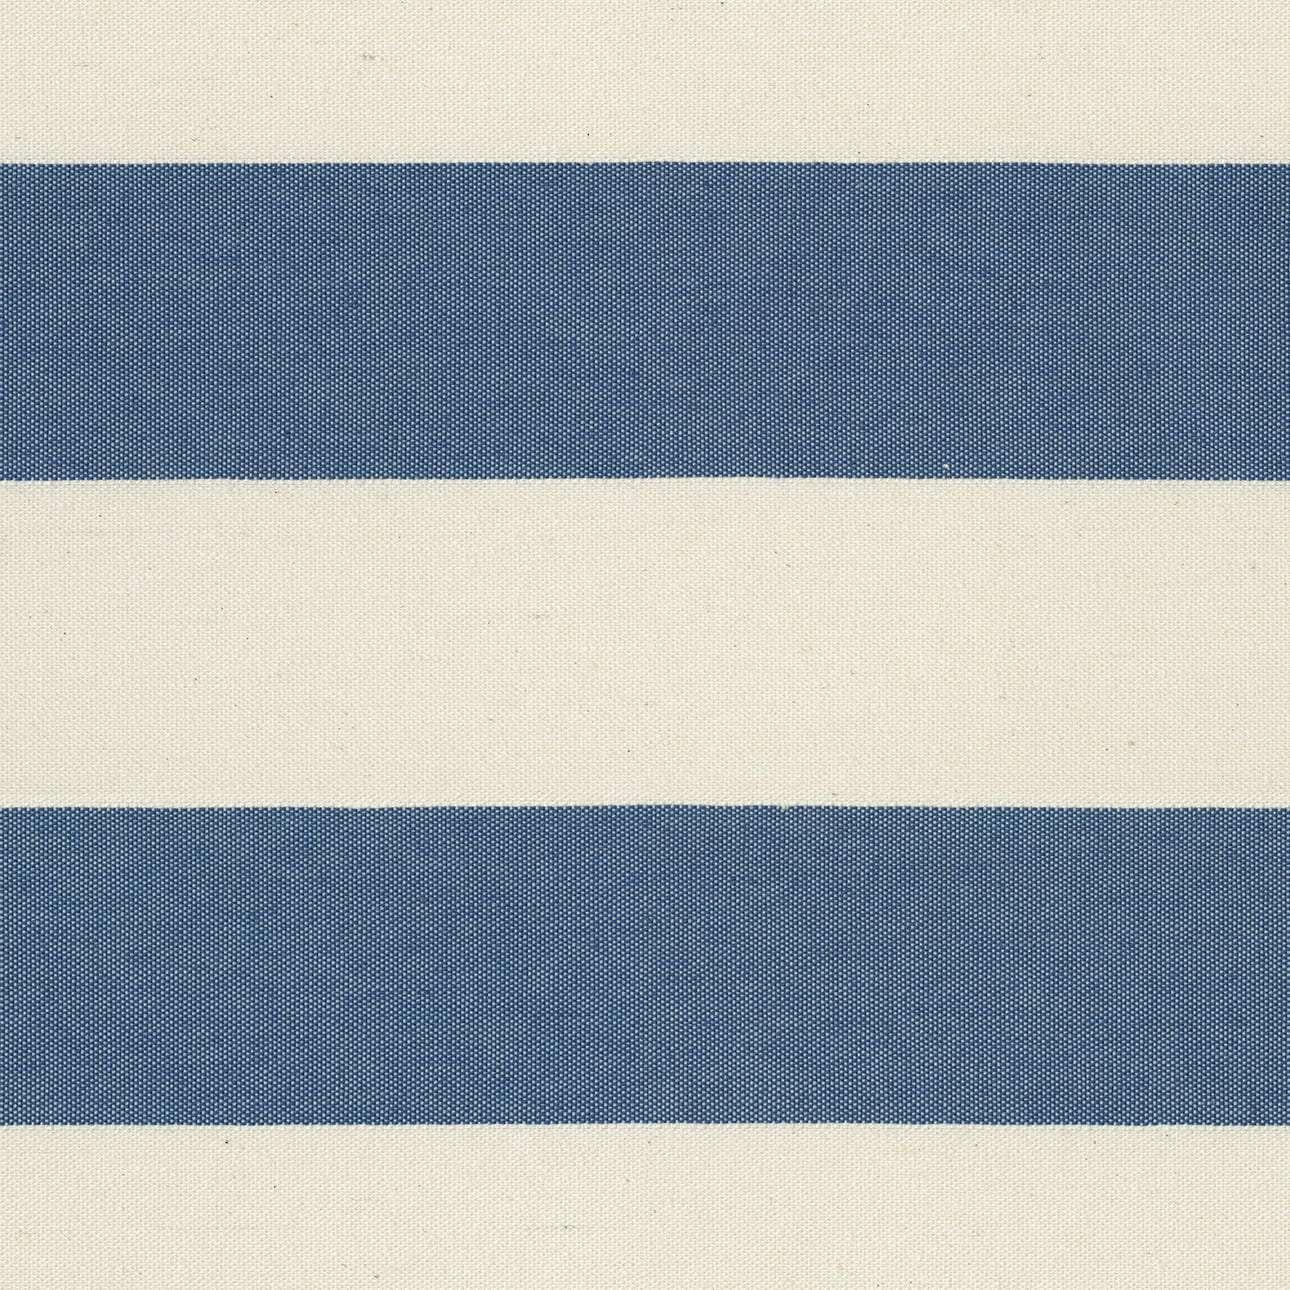 Quadro 142-70 V kolekcii Quadro, tkanina: 142-70